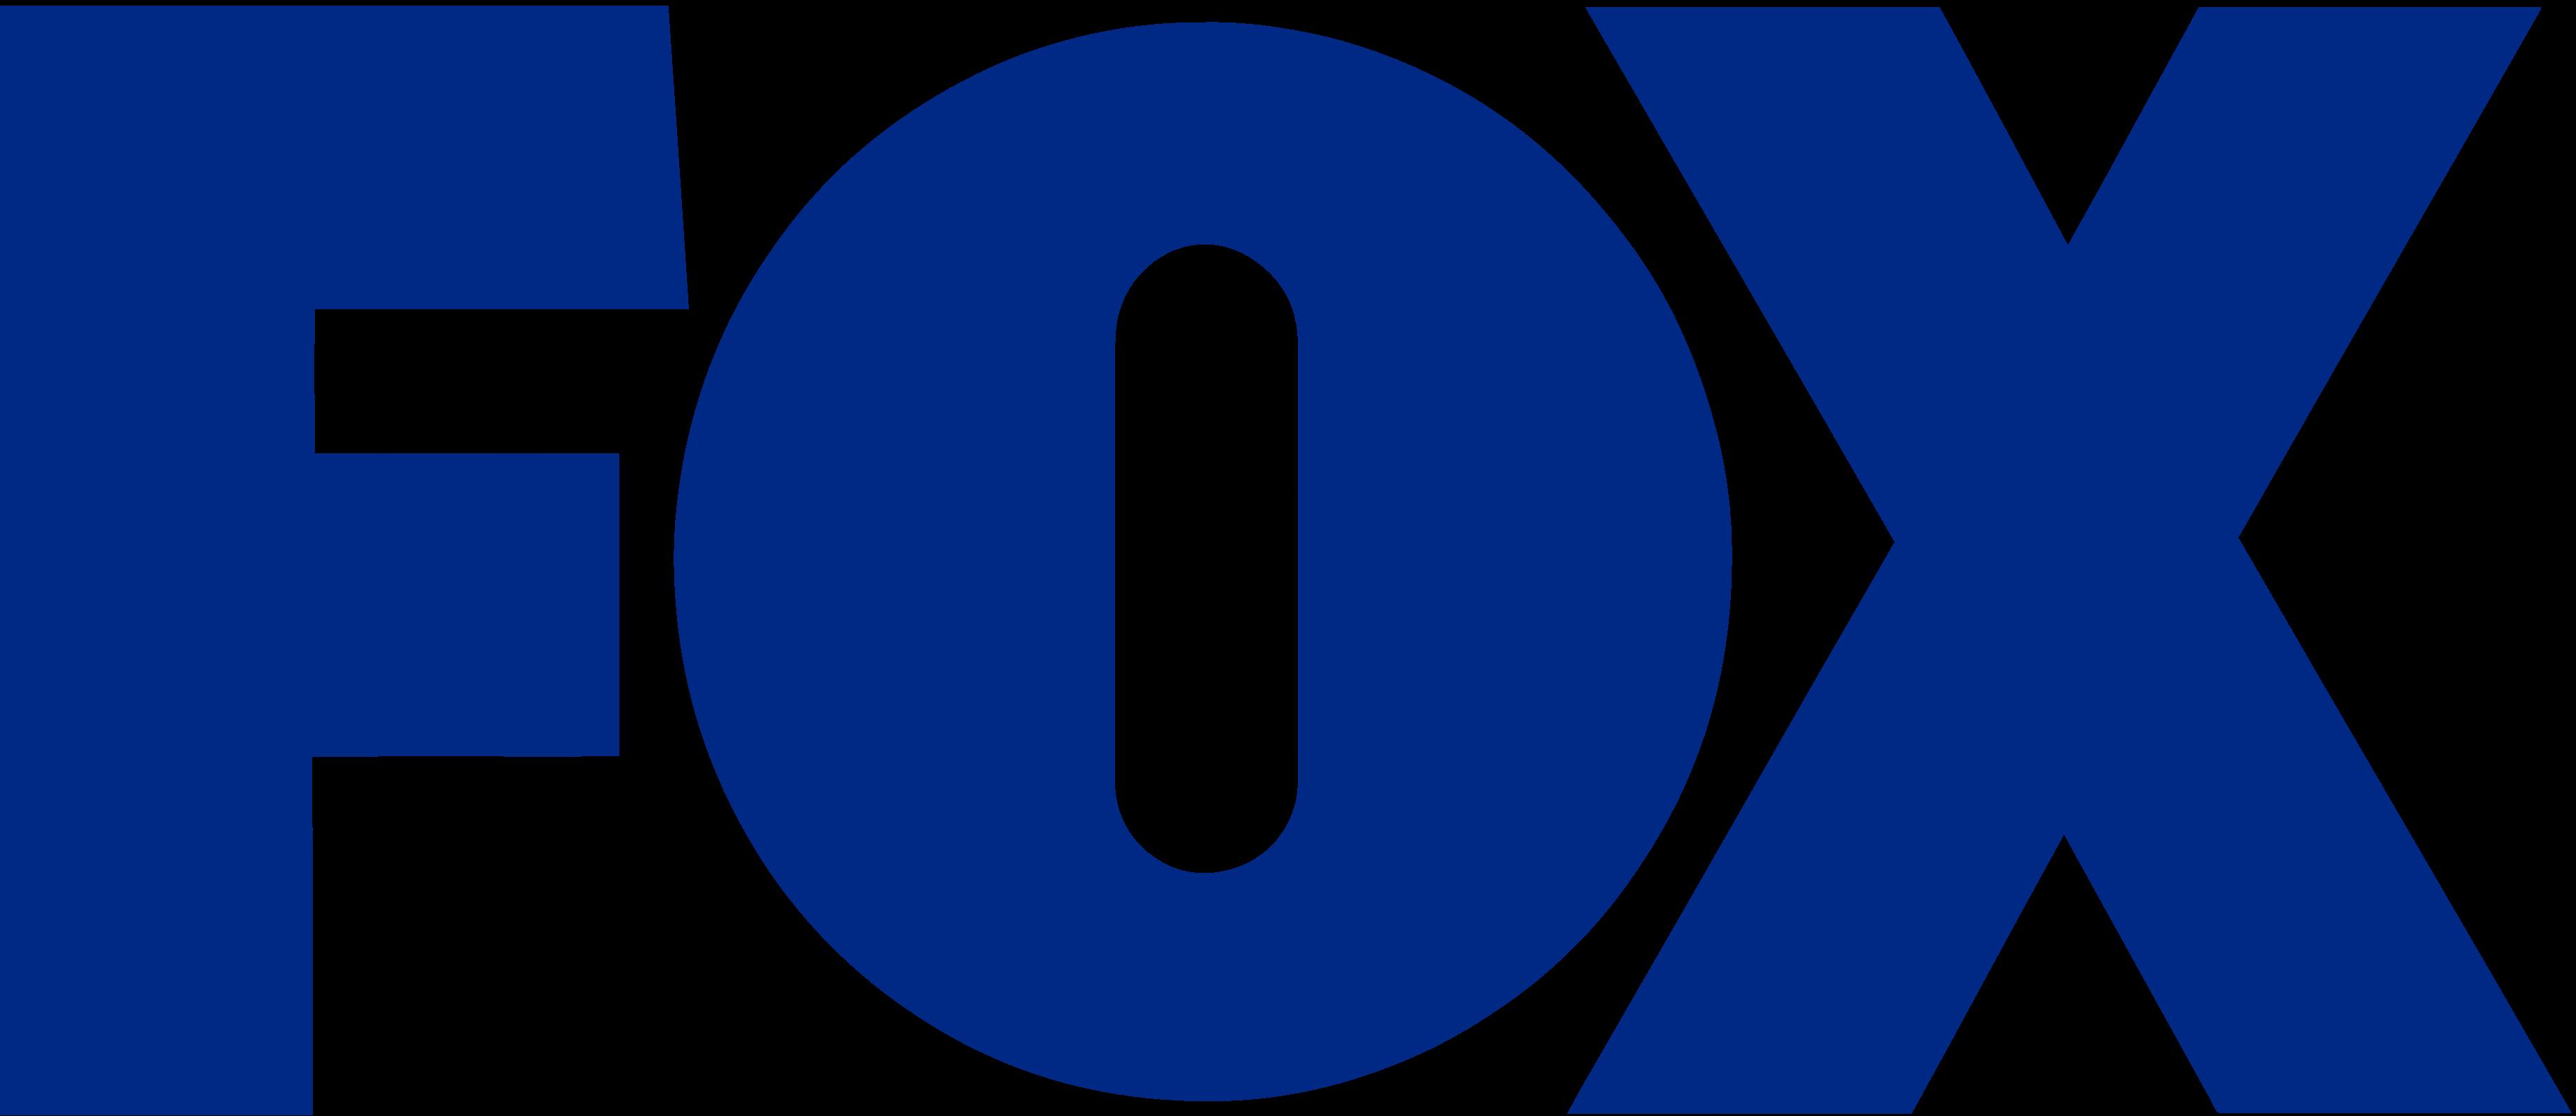 Fox Network logo